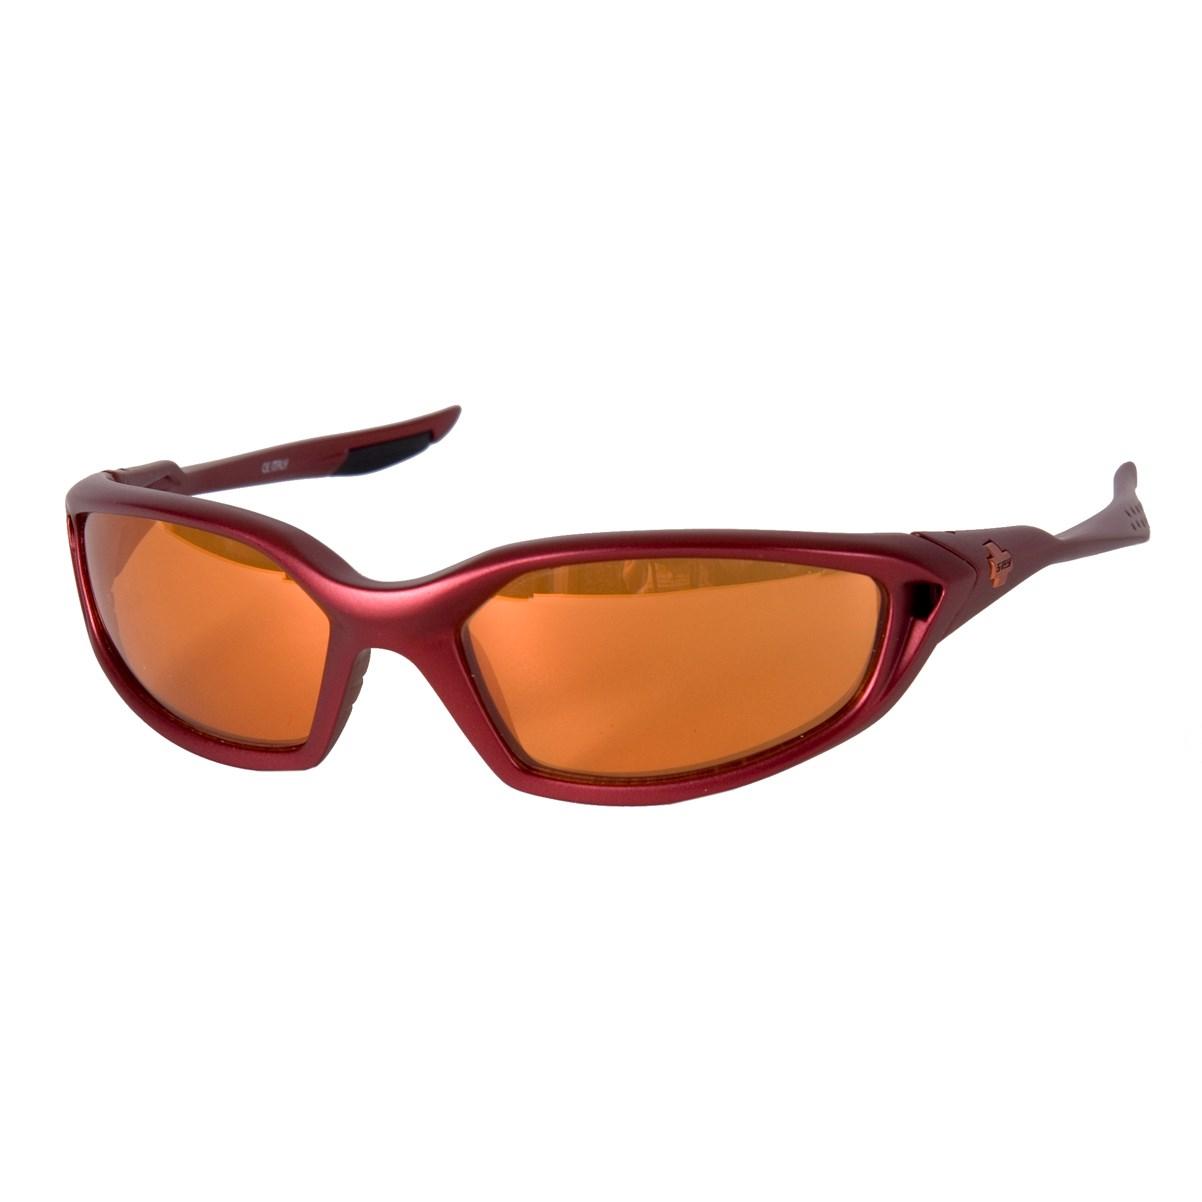 5fbd346d6d Spy M2 Scoop Sunglasses